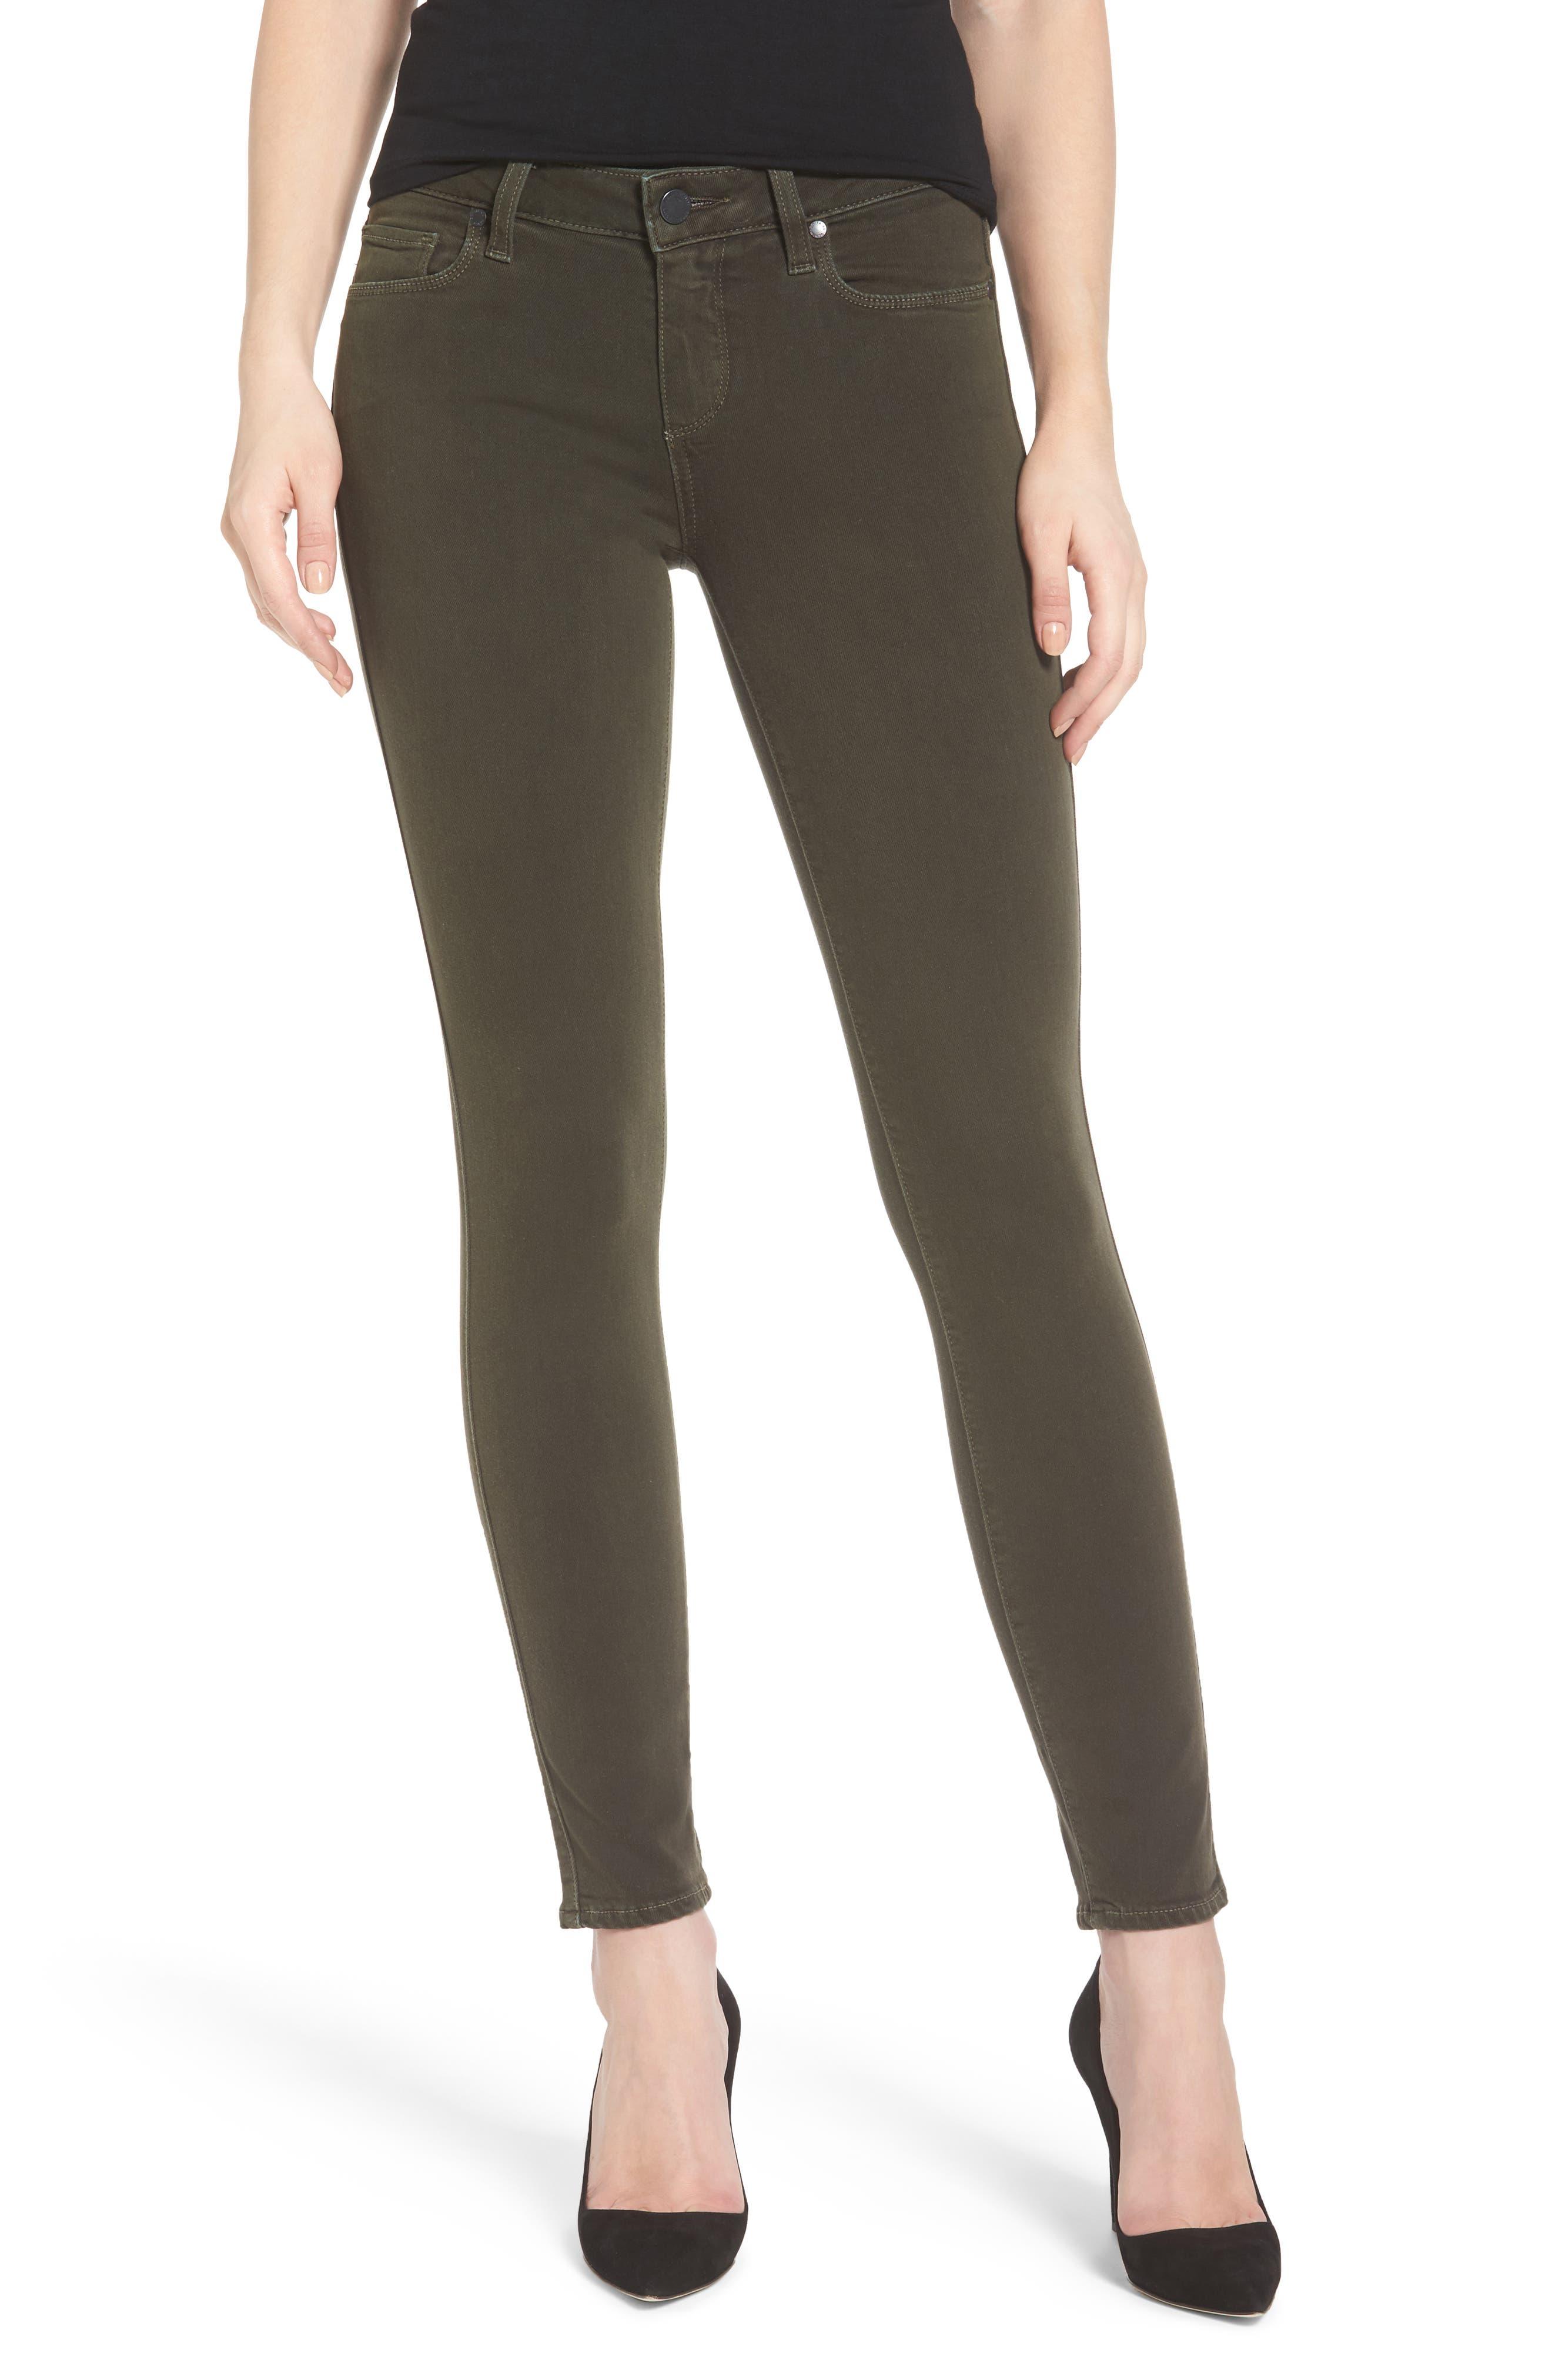 PAIGE Transcend - Verdugo Ankle Skinny Jeans